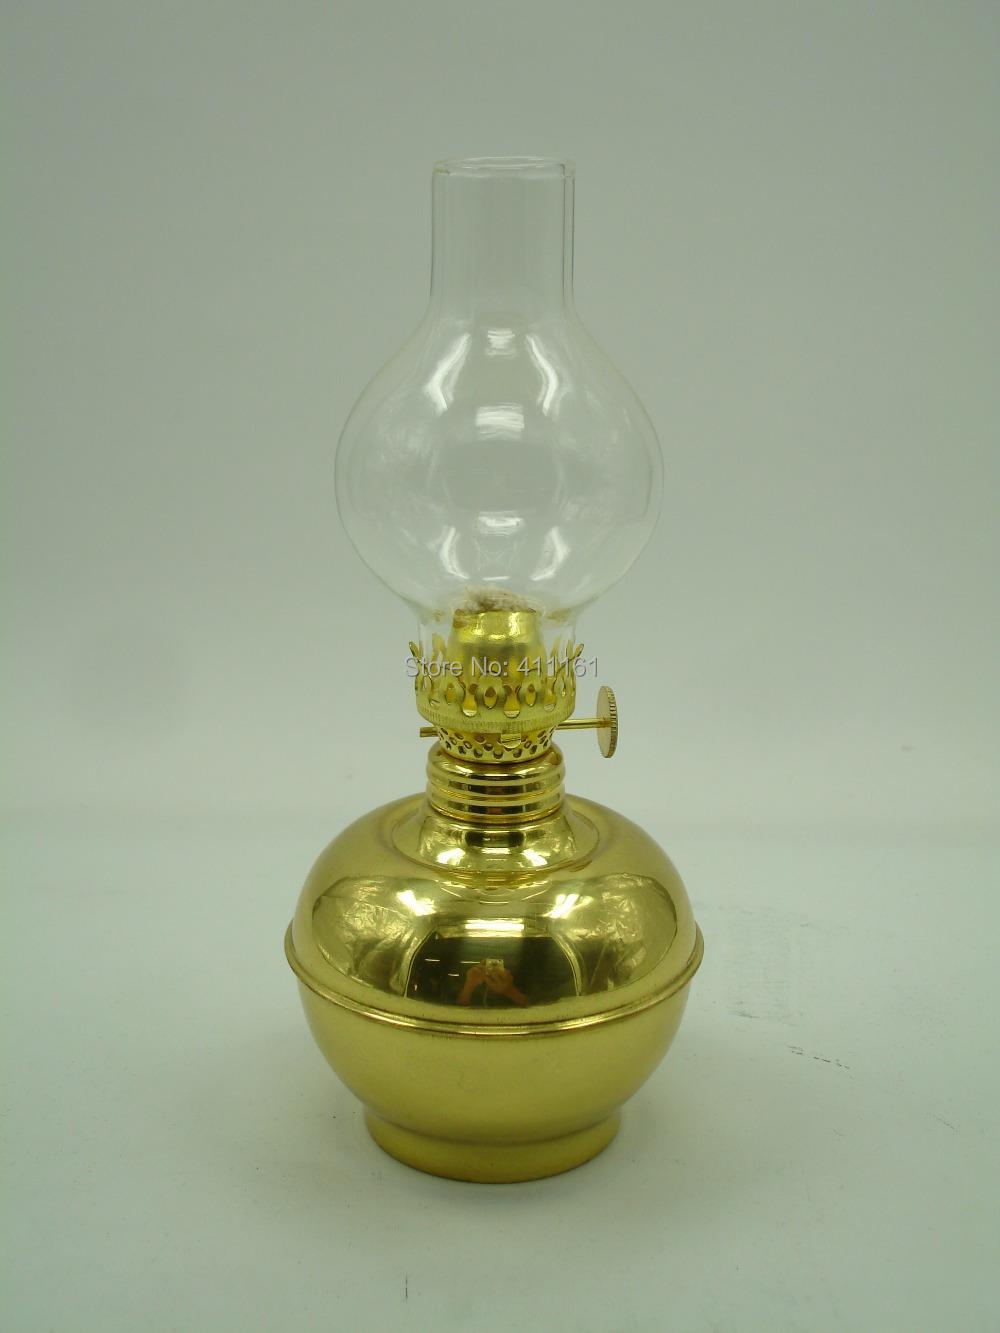 Deluxe Brass Evening Lamp Antique Brass Oil Lamp Lighting